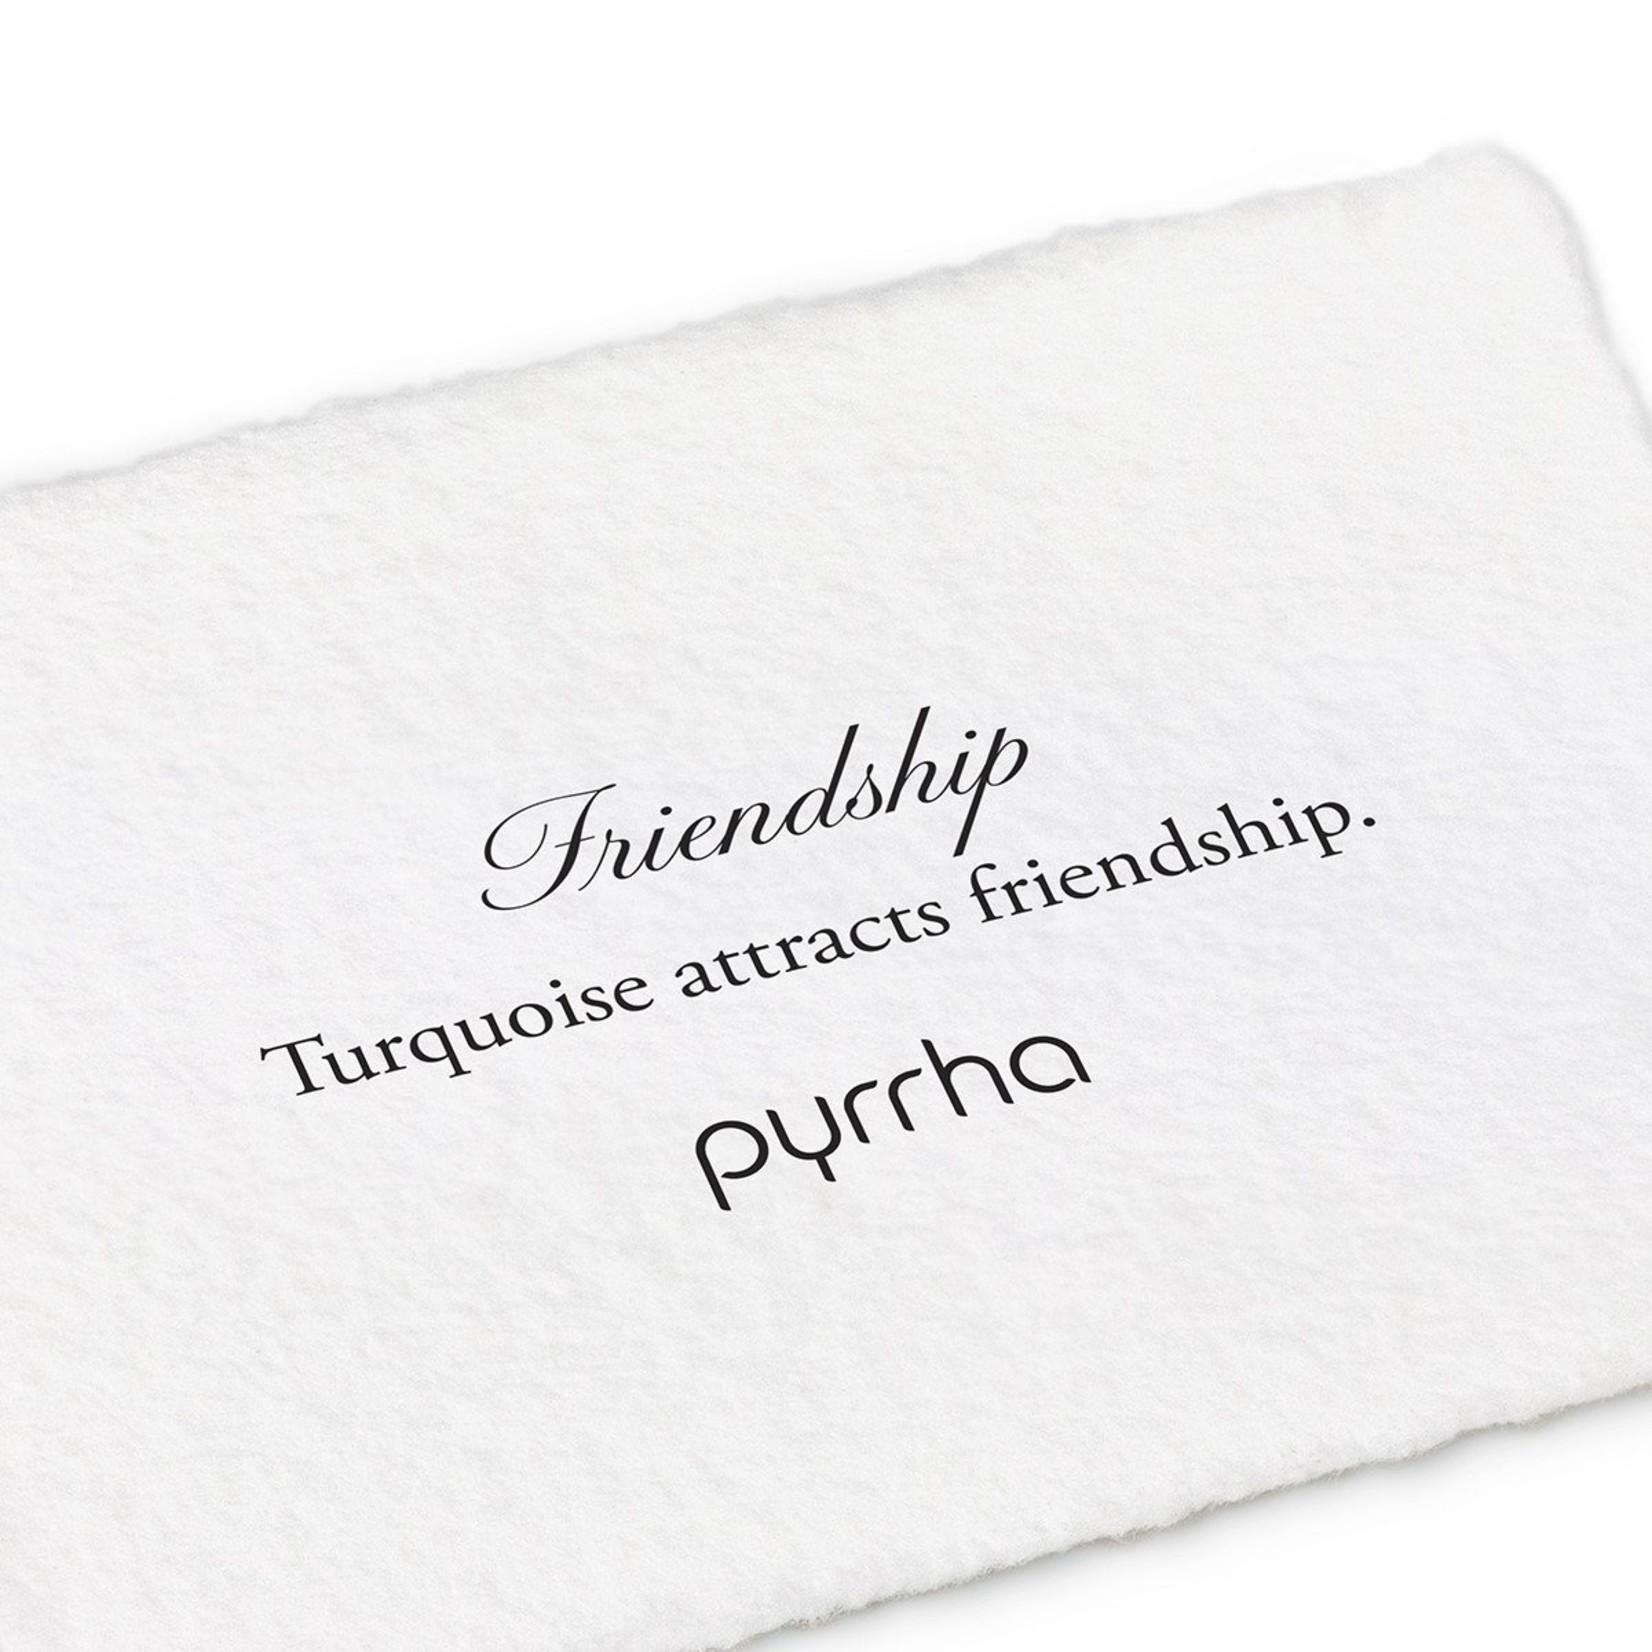 Pyrrha Friendship Signature Attraction Charm